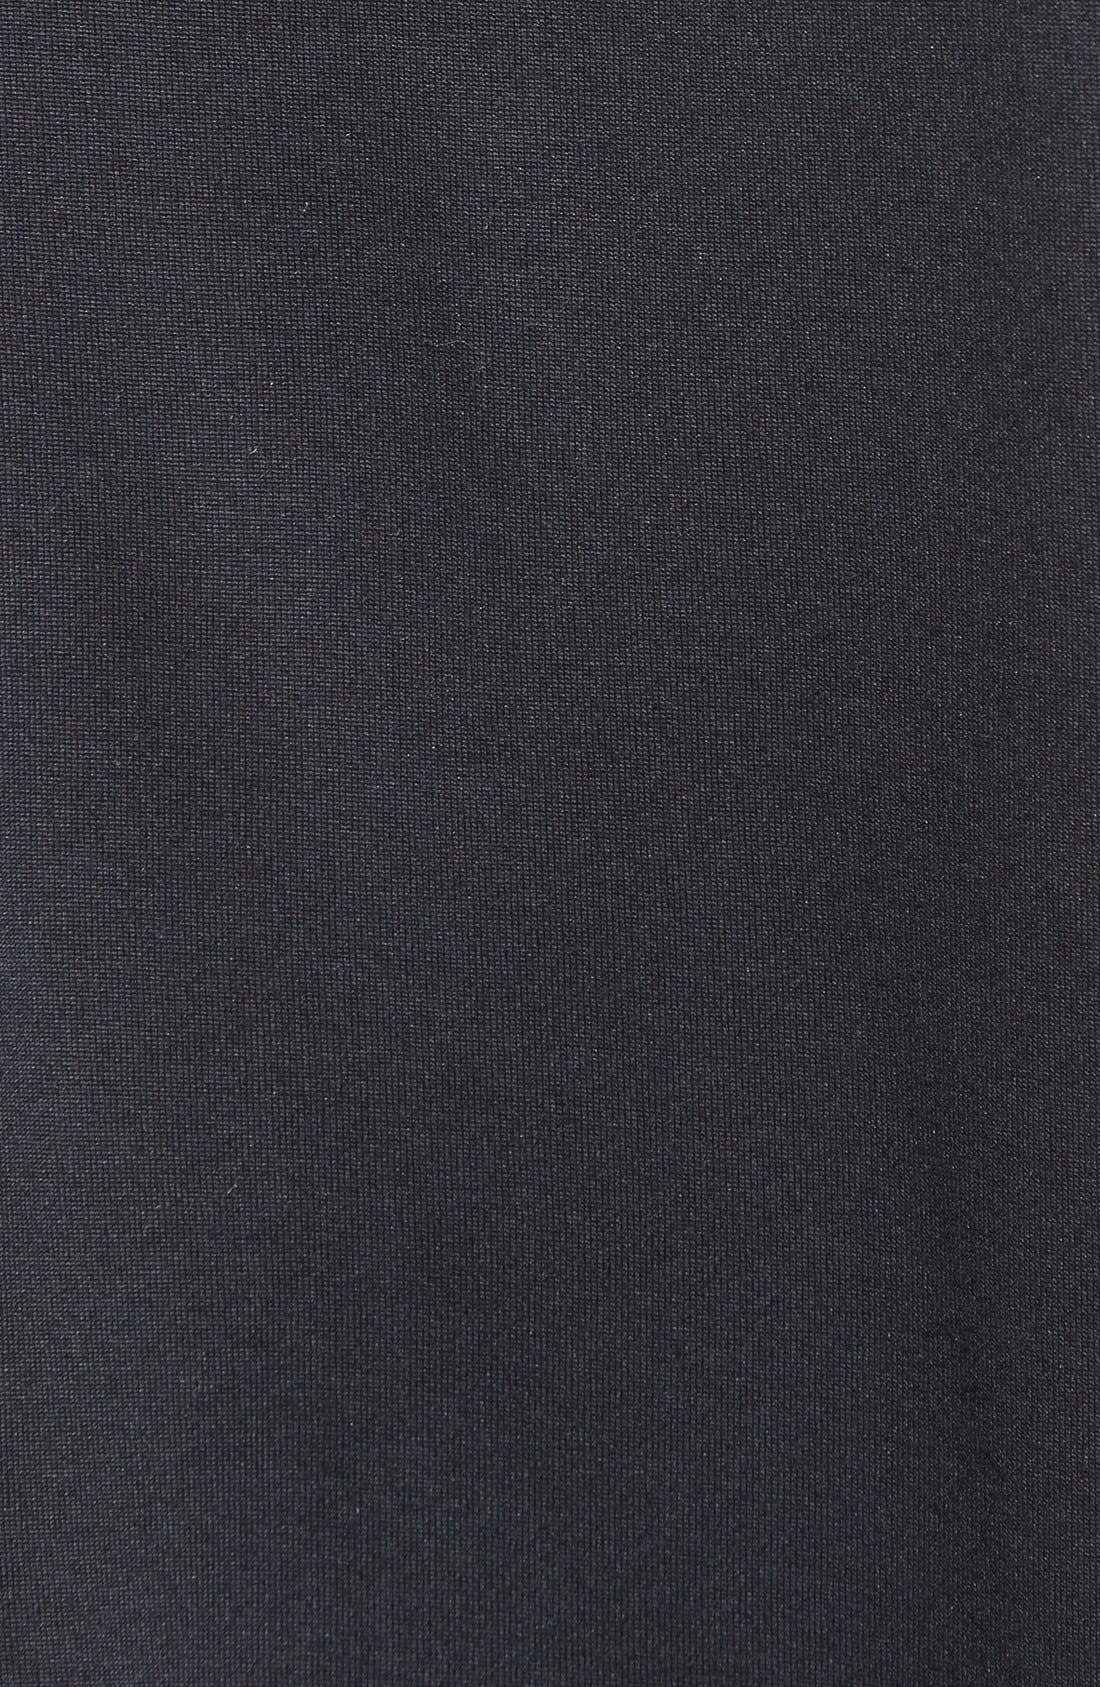 'Legend - Every Damn Day' Dri-FIT Basketball T-Shirt,                             Alternate thumbnail 3, color,                             010